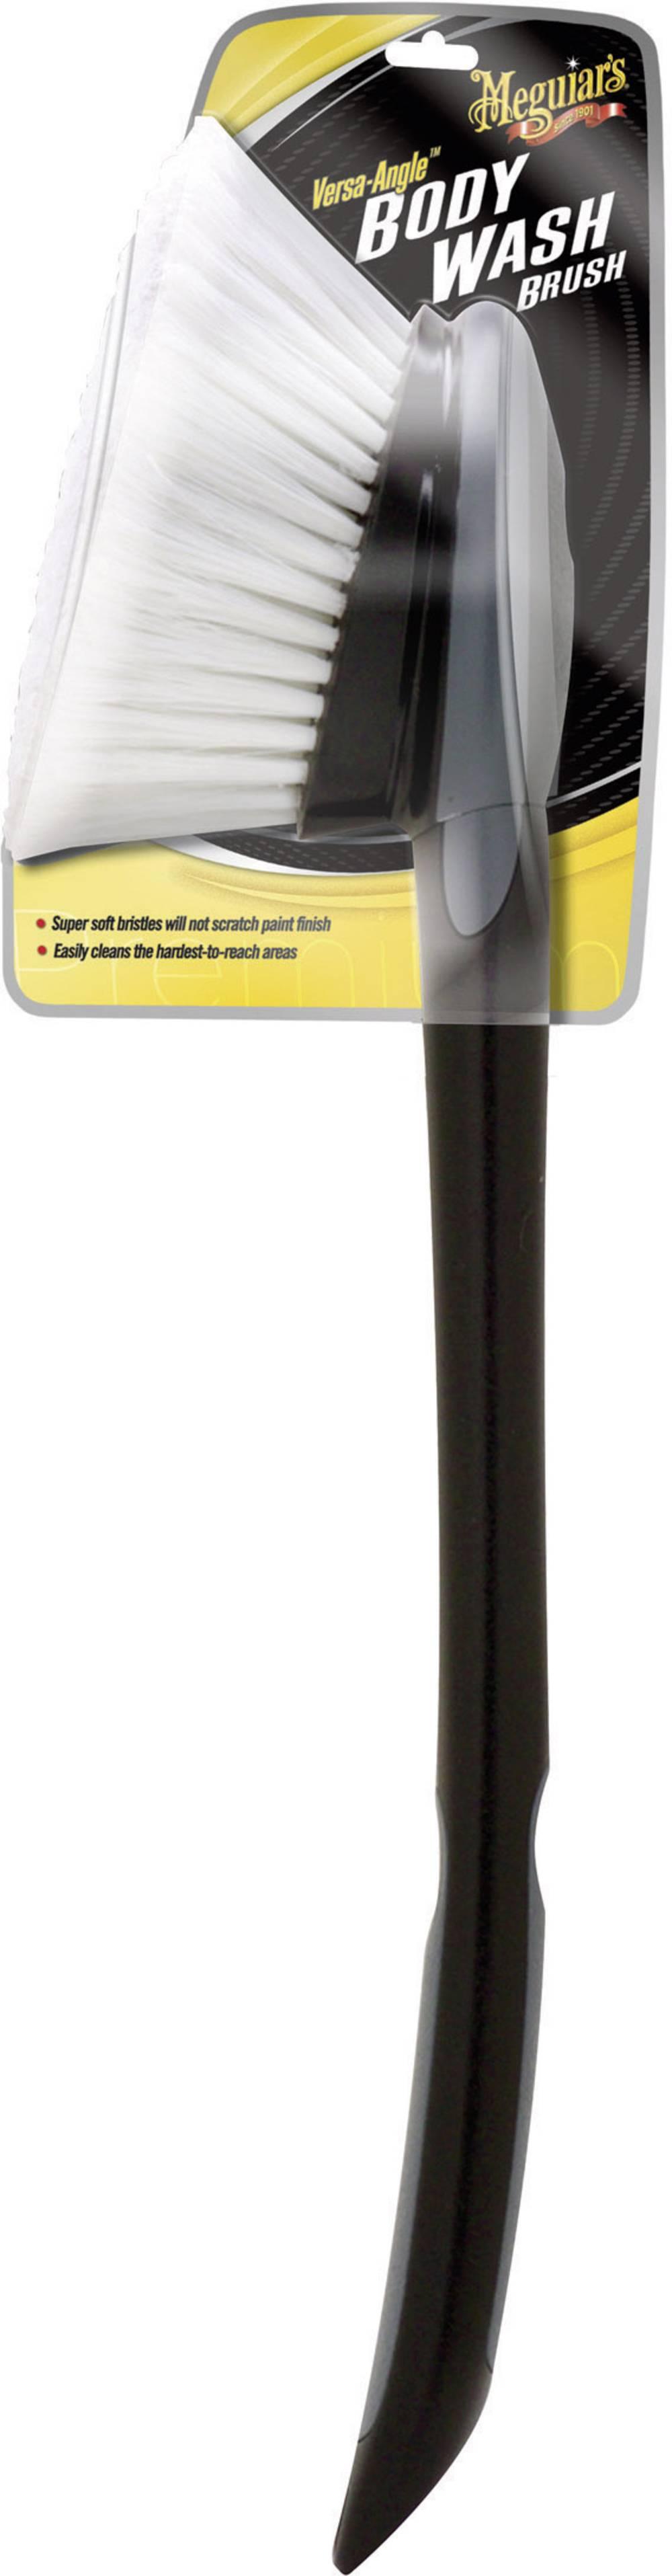 Rensebørste Versa-Angle Krop Brush Meguiars X1030 1 stk